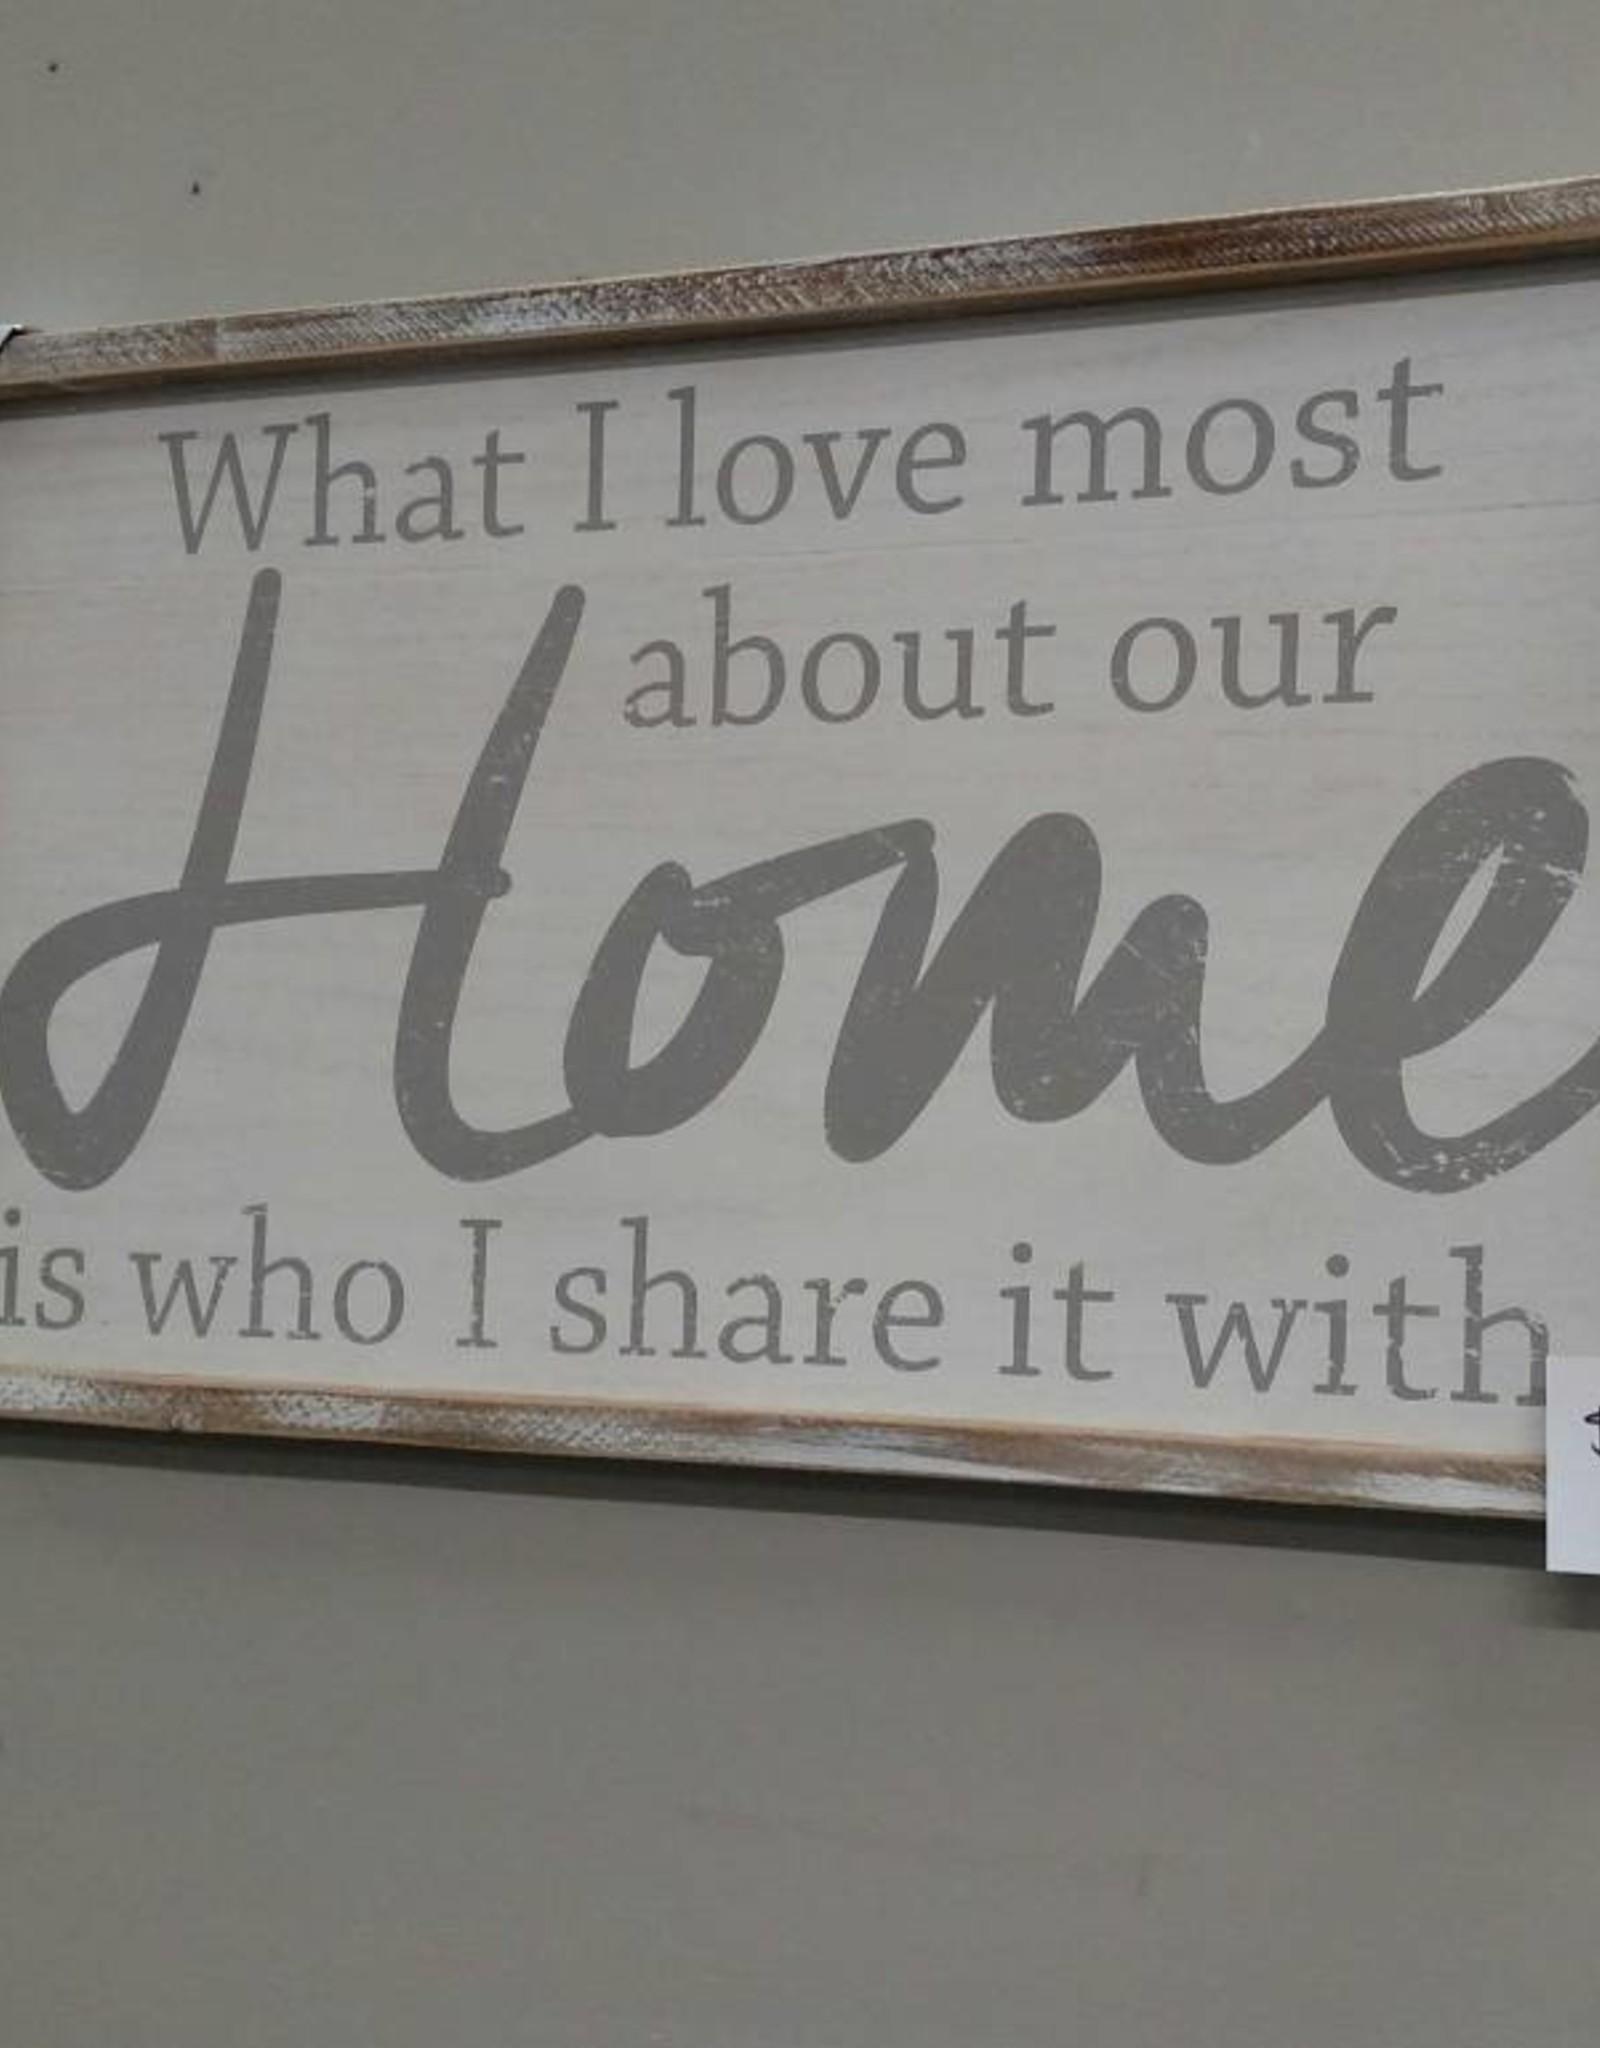 Adams & Co Home - who I share with